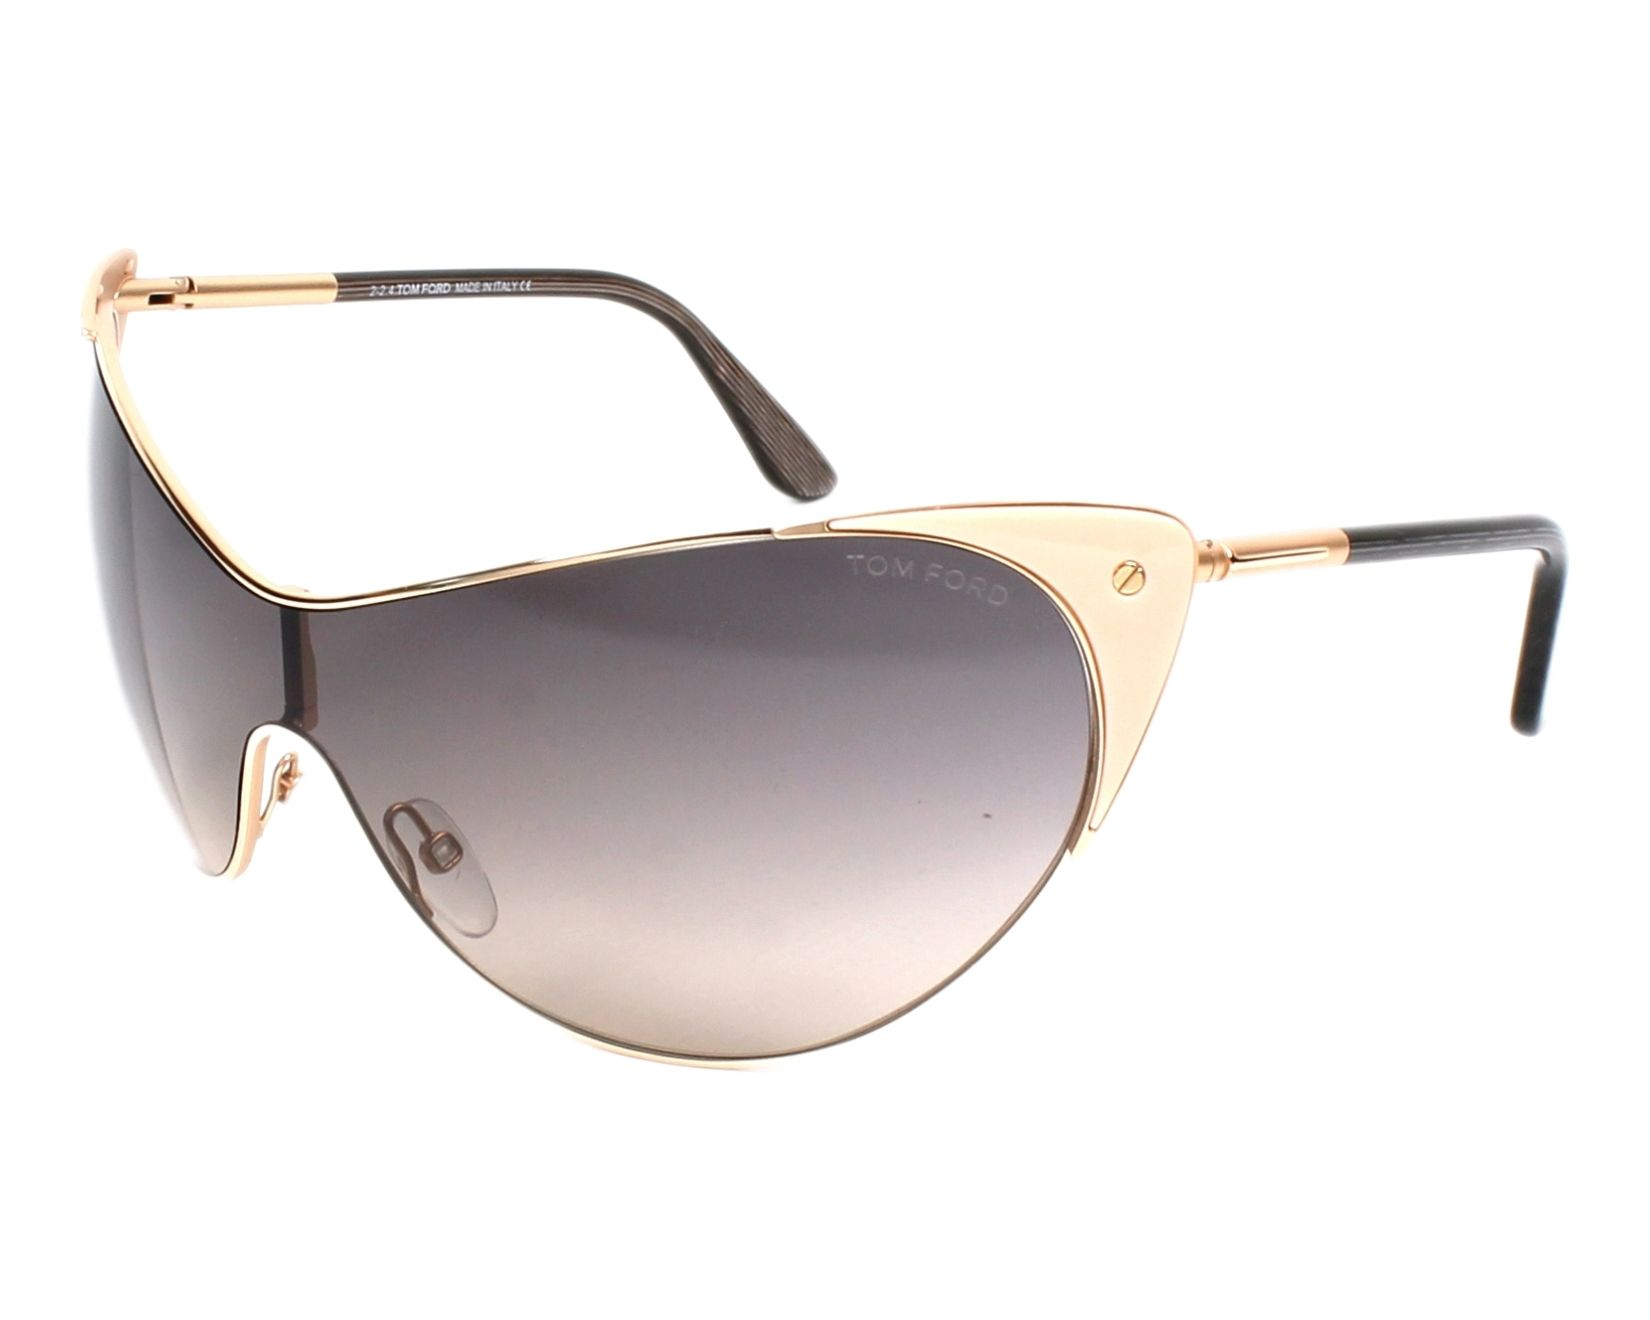 9412f5e44d3b Sunglasses Tom Ford TF-0364 74B - Gold Rosa profile view